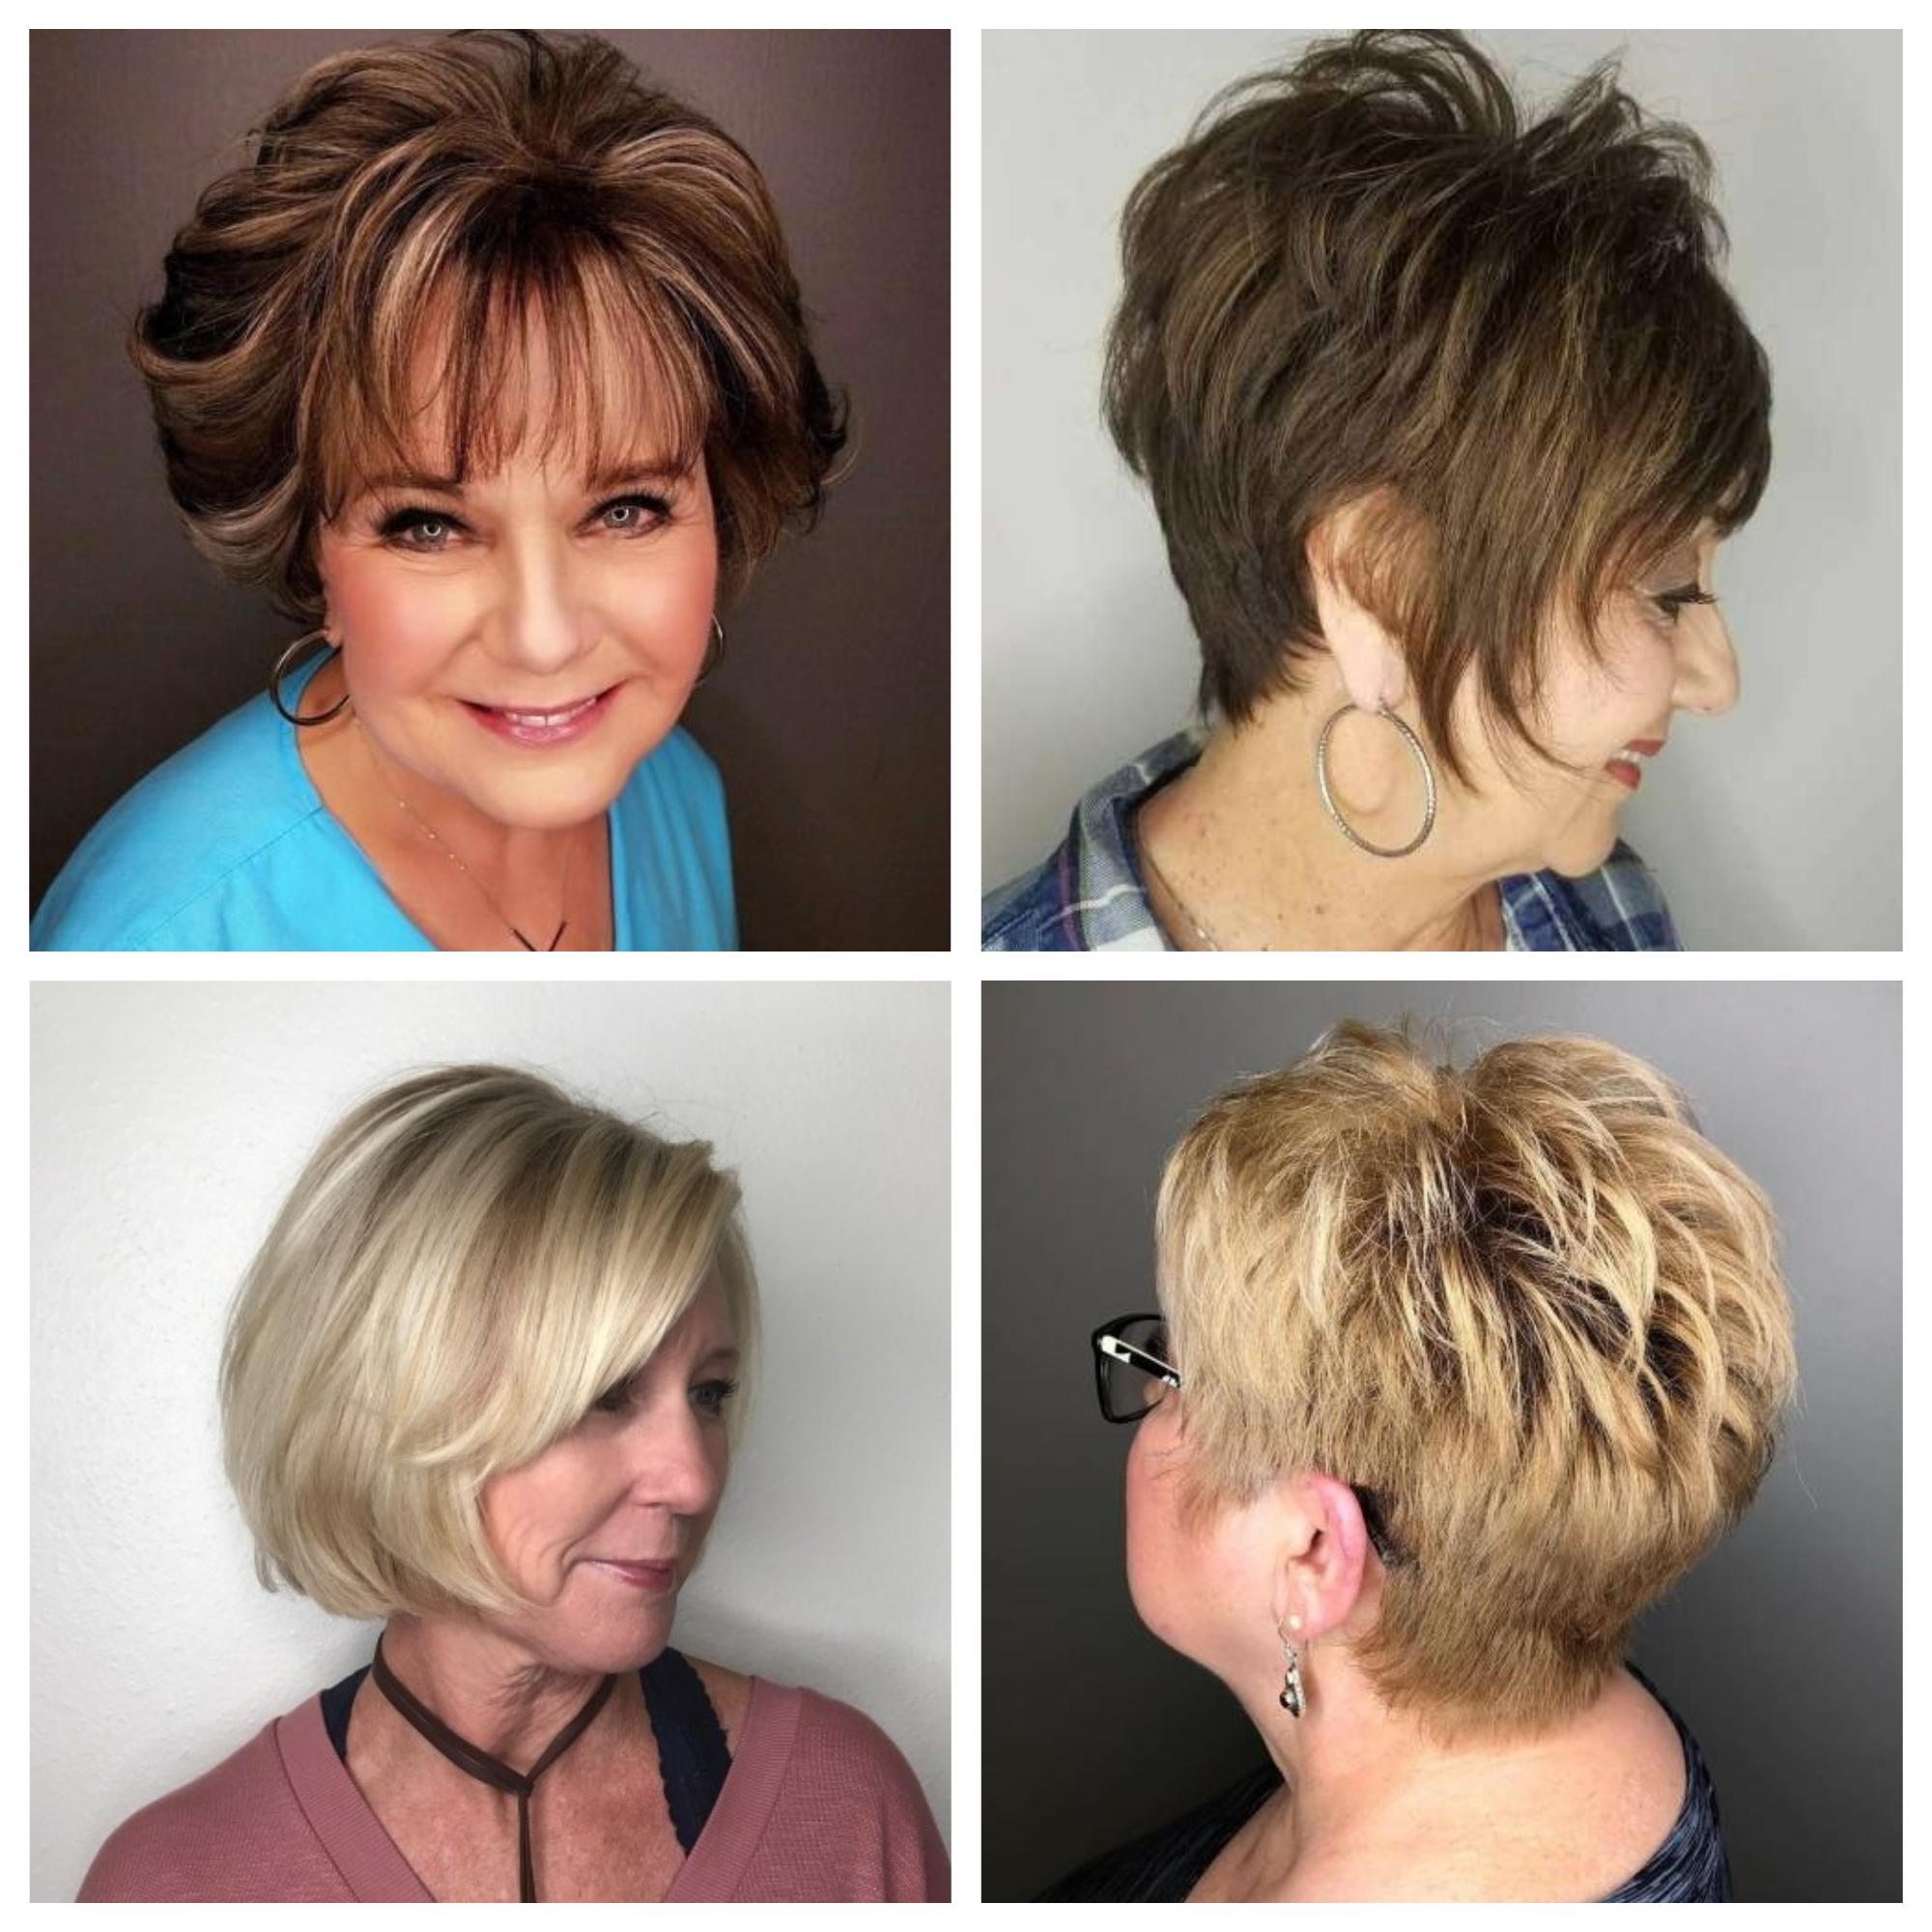 chic haircuts | 2019 haircuts, hairstyles and hair colors